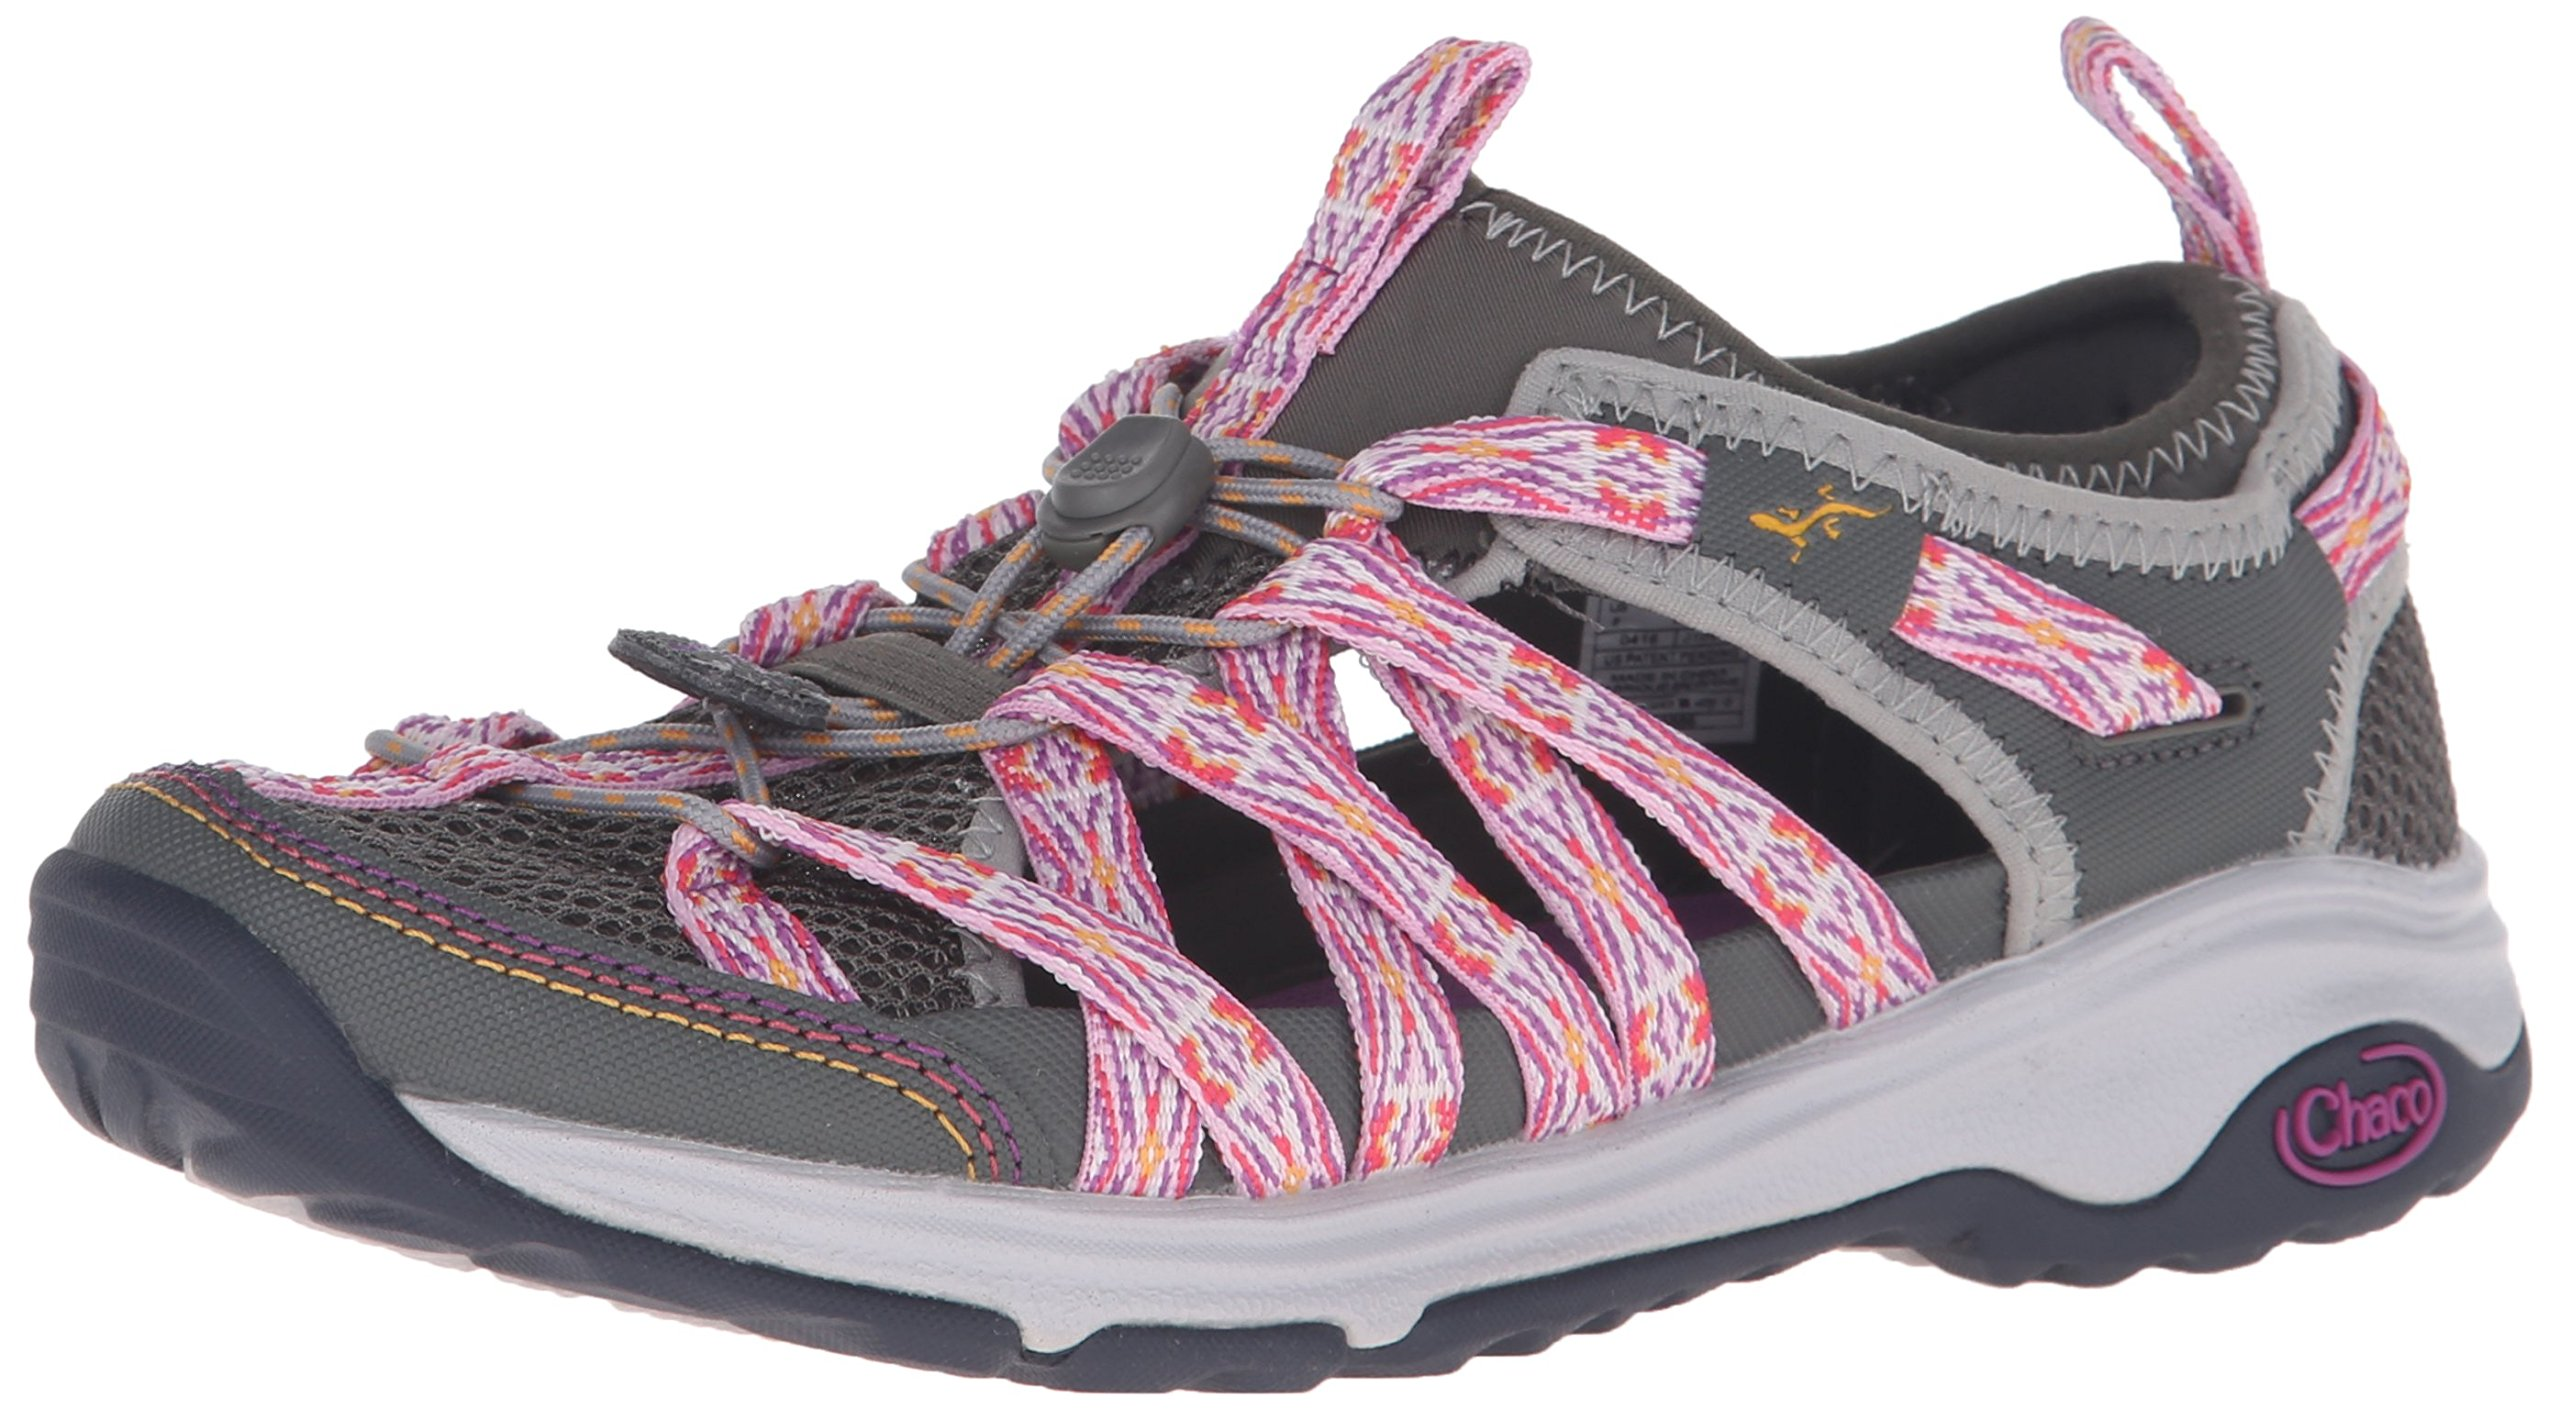 Chaco Women's Outcross EVO 1 Sport Water Shoe, Violet, 8.5 M US